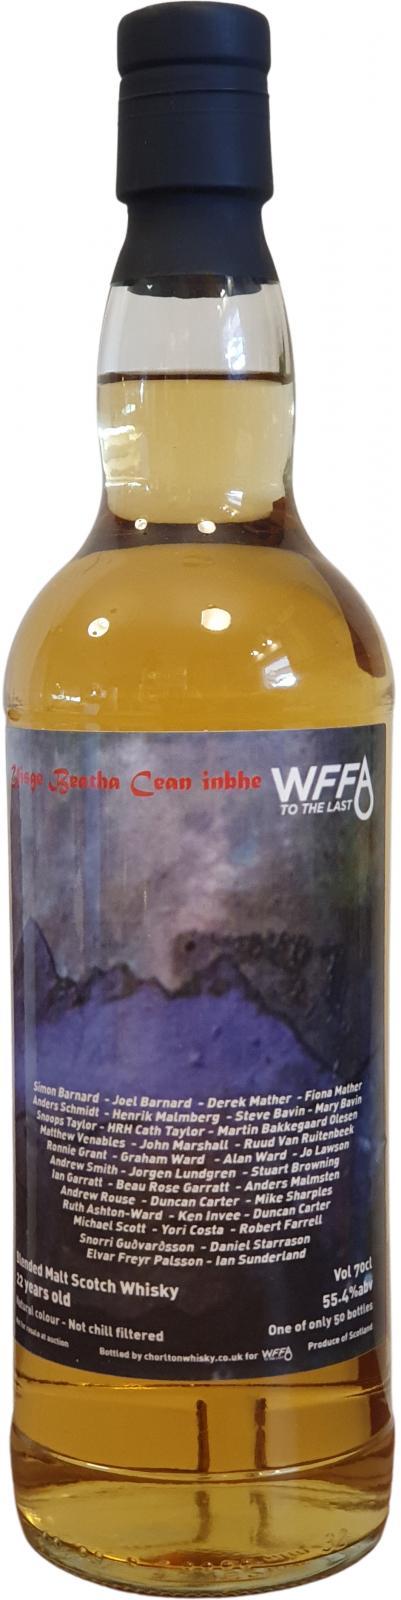 Blended Malt Scotch Whisky 22-year-old WFFA